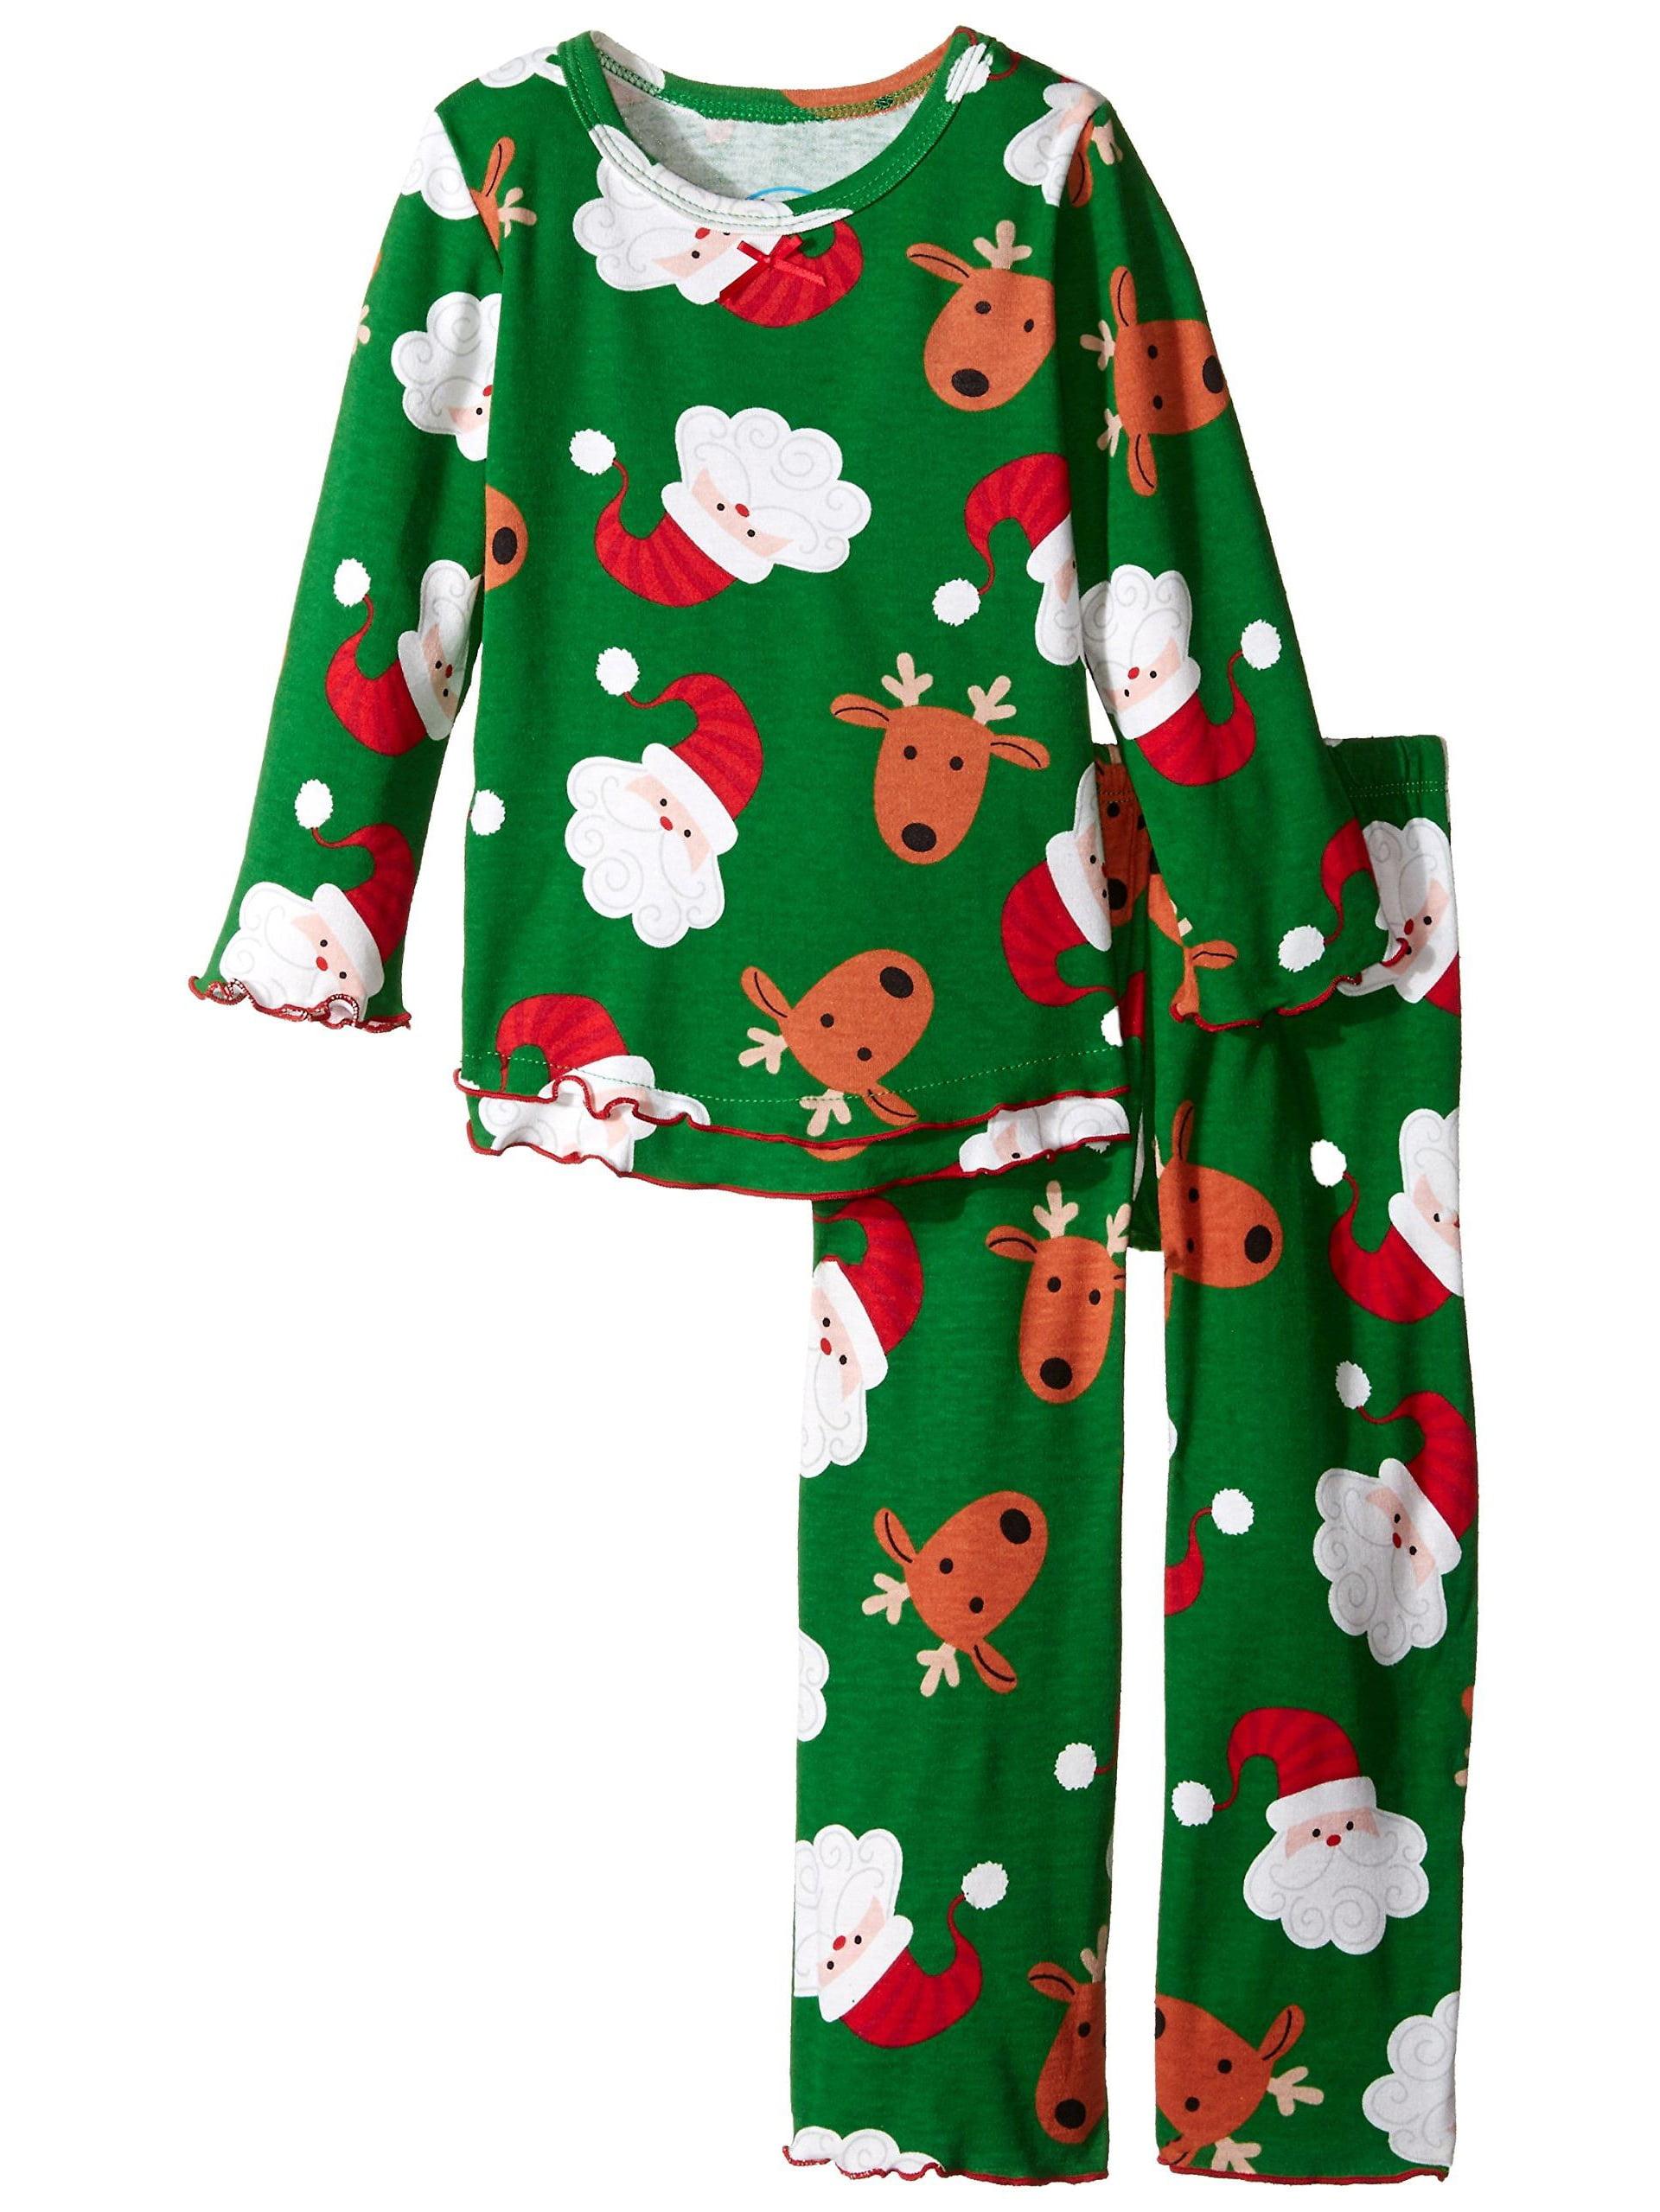 Kids Size 12 Saras Prints Girls Pink Ruffle Top /& Pant Pajama Set